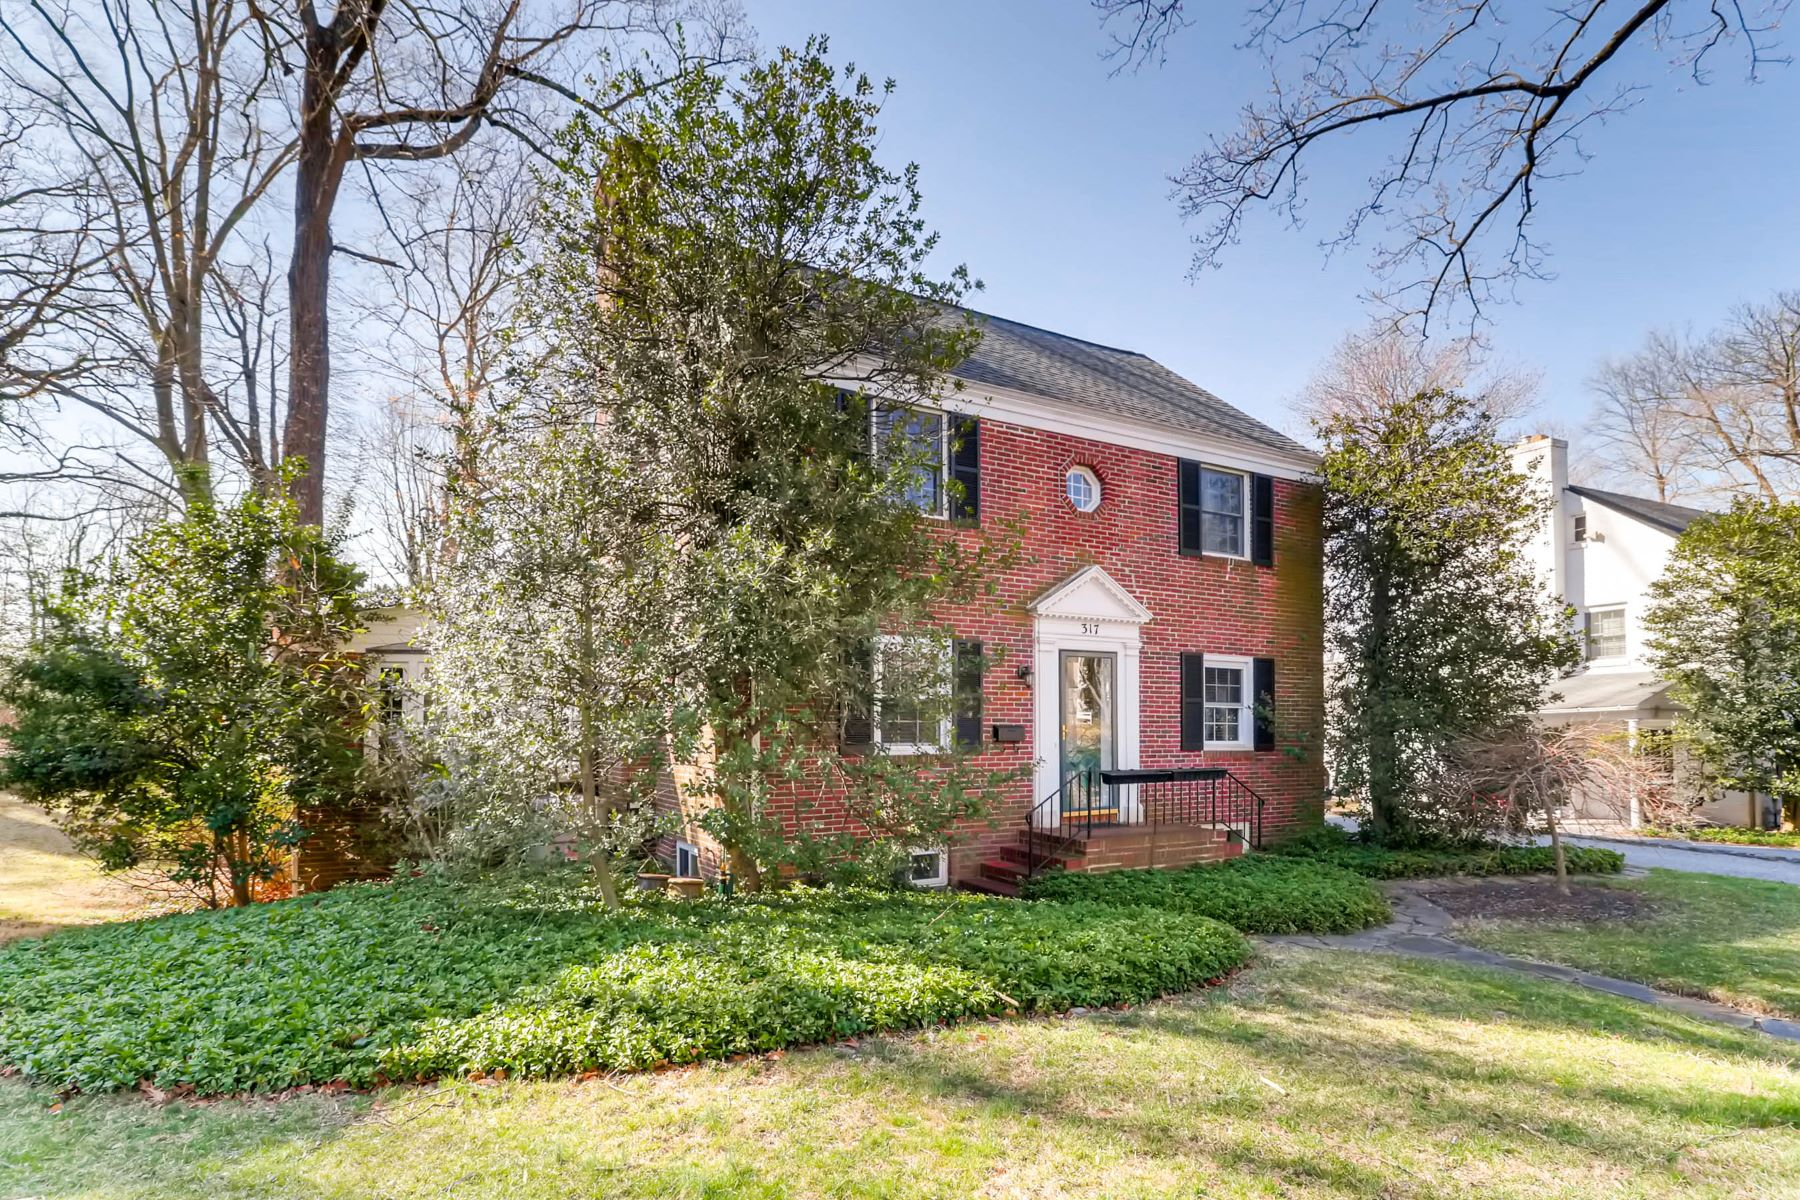 Casa Unifamiliar por un Venta en 317 Dixie Drive Towson, Maryland 21204 Towson, Maryland 21204 Estados Unidos